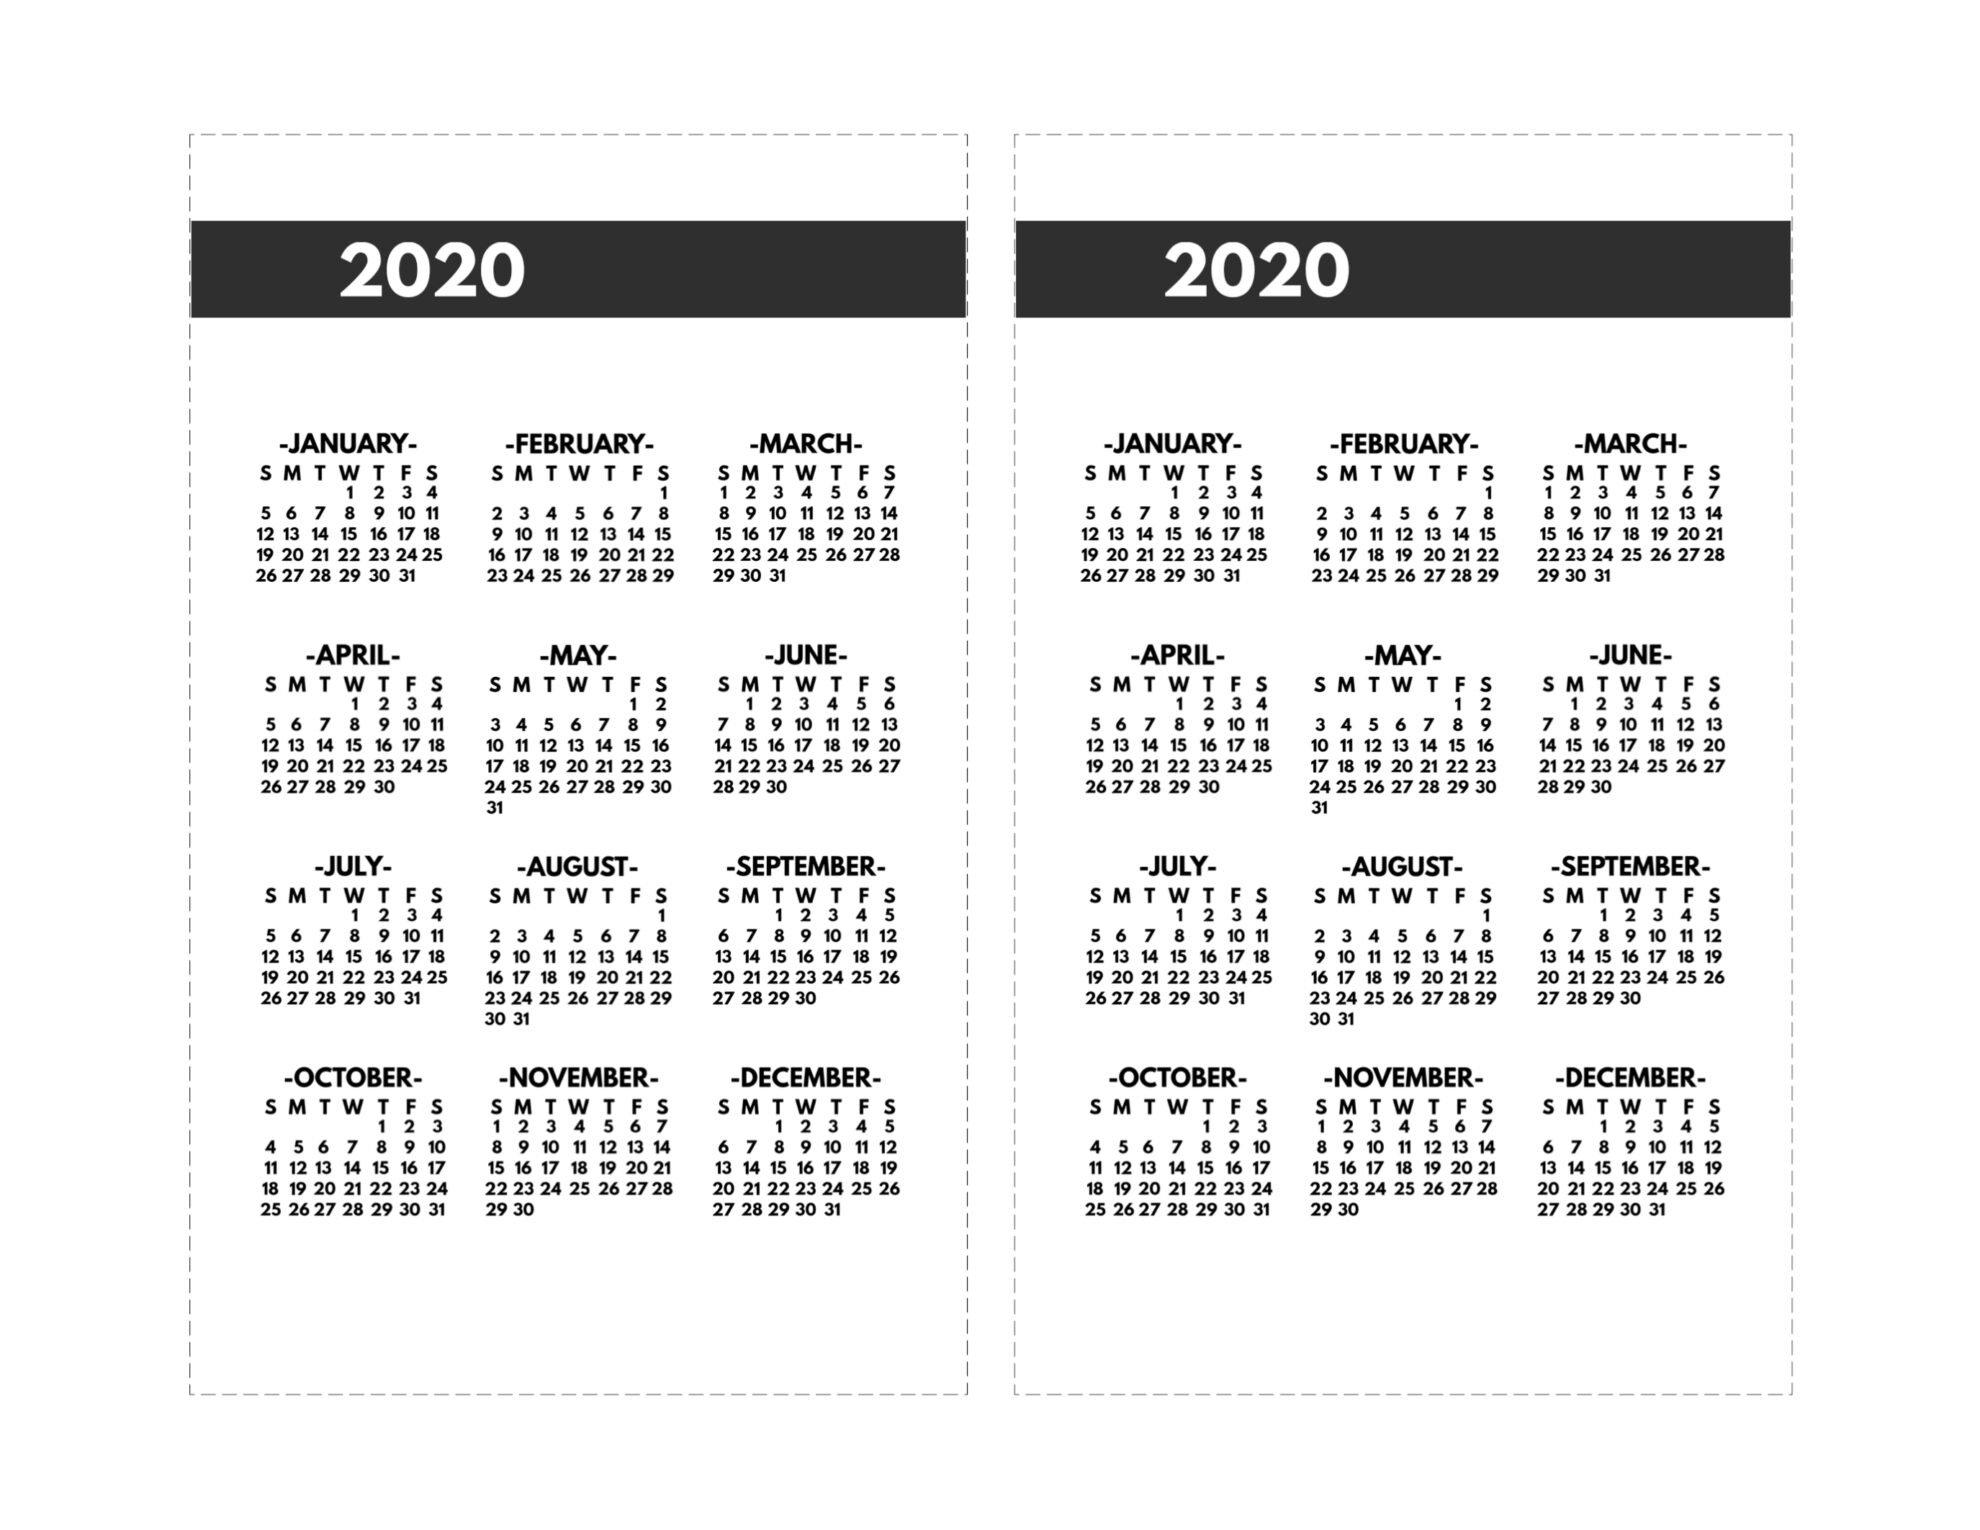 2020 Calendar 8 1/2 X 11 | Free Printable Calendar Free Printable Calendars 5 1/2 X 8 1/2